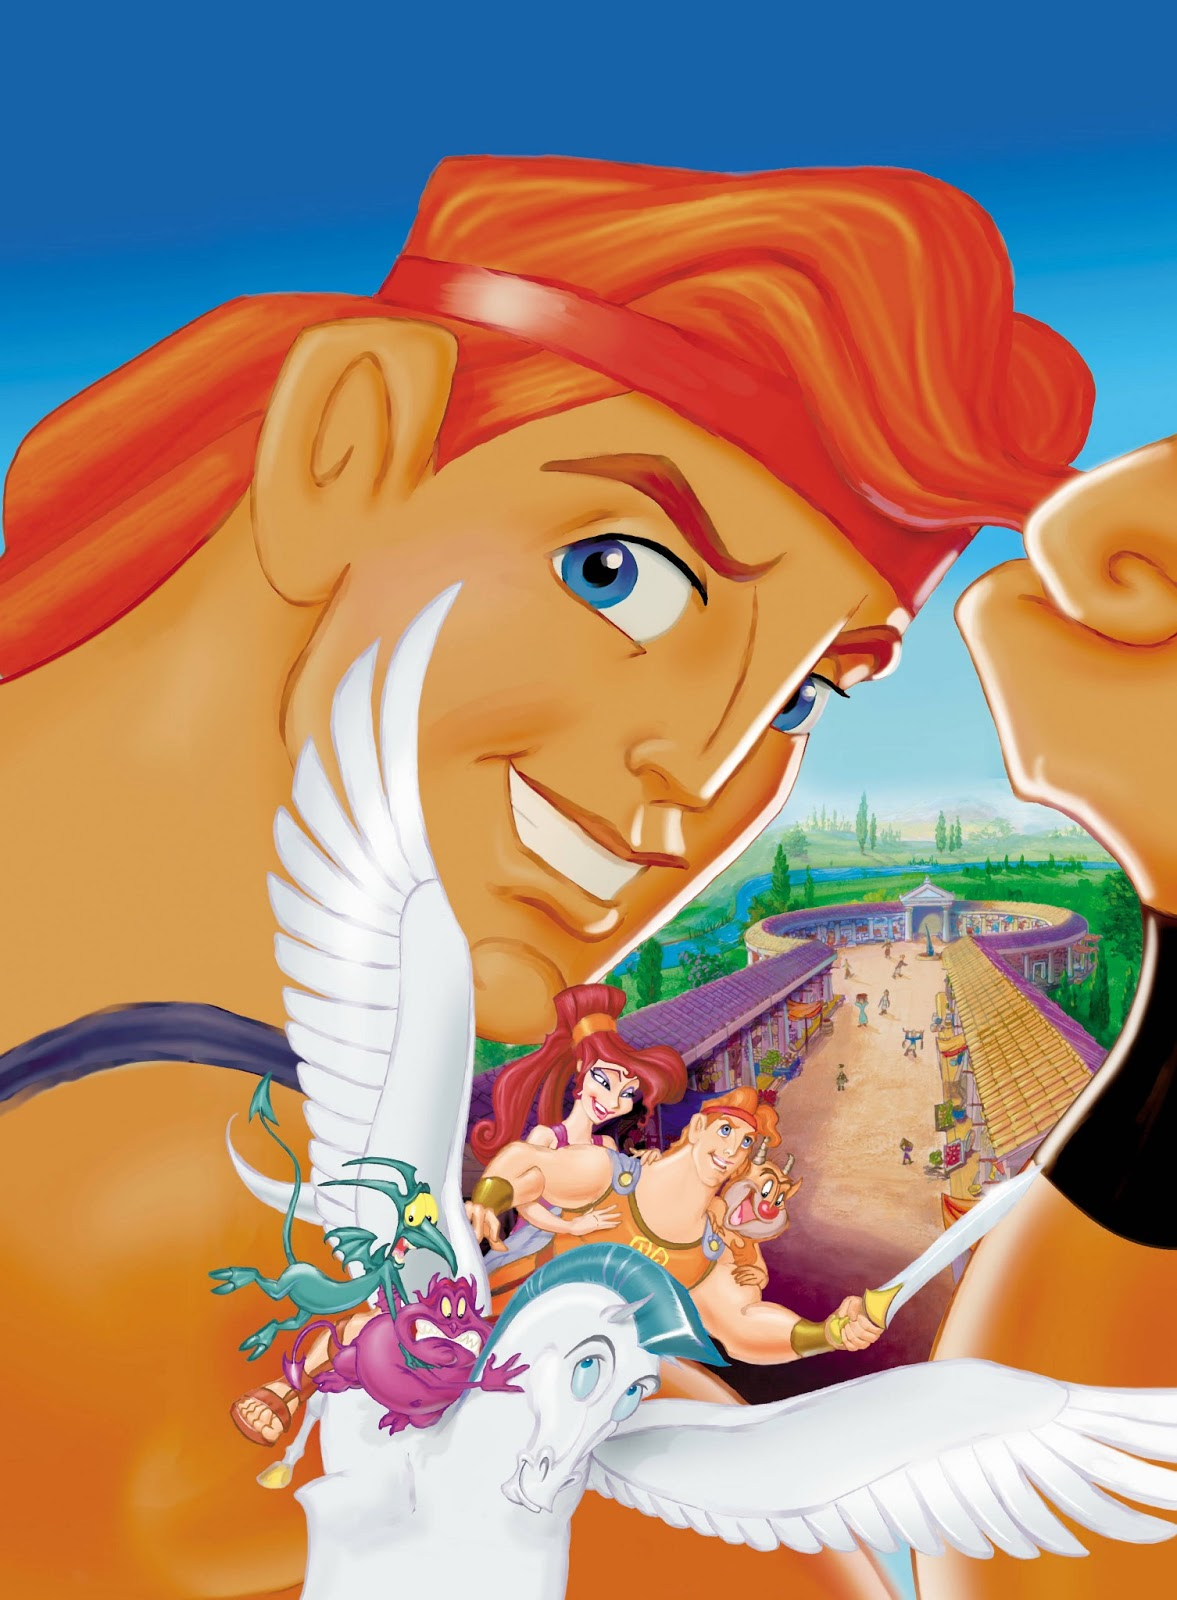 Hercules! De Disney Hercules+walt+disney+blu+ray+august+agosto+2013+poster+cartel+clasico+heroe+platinum+edition+megara+pegasus+pegaso+philoctetes+pena+panico+pain+panic